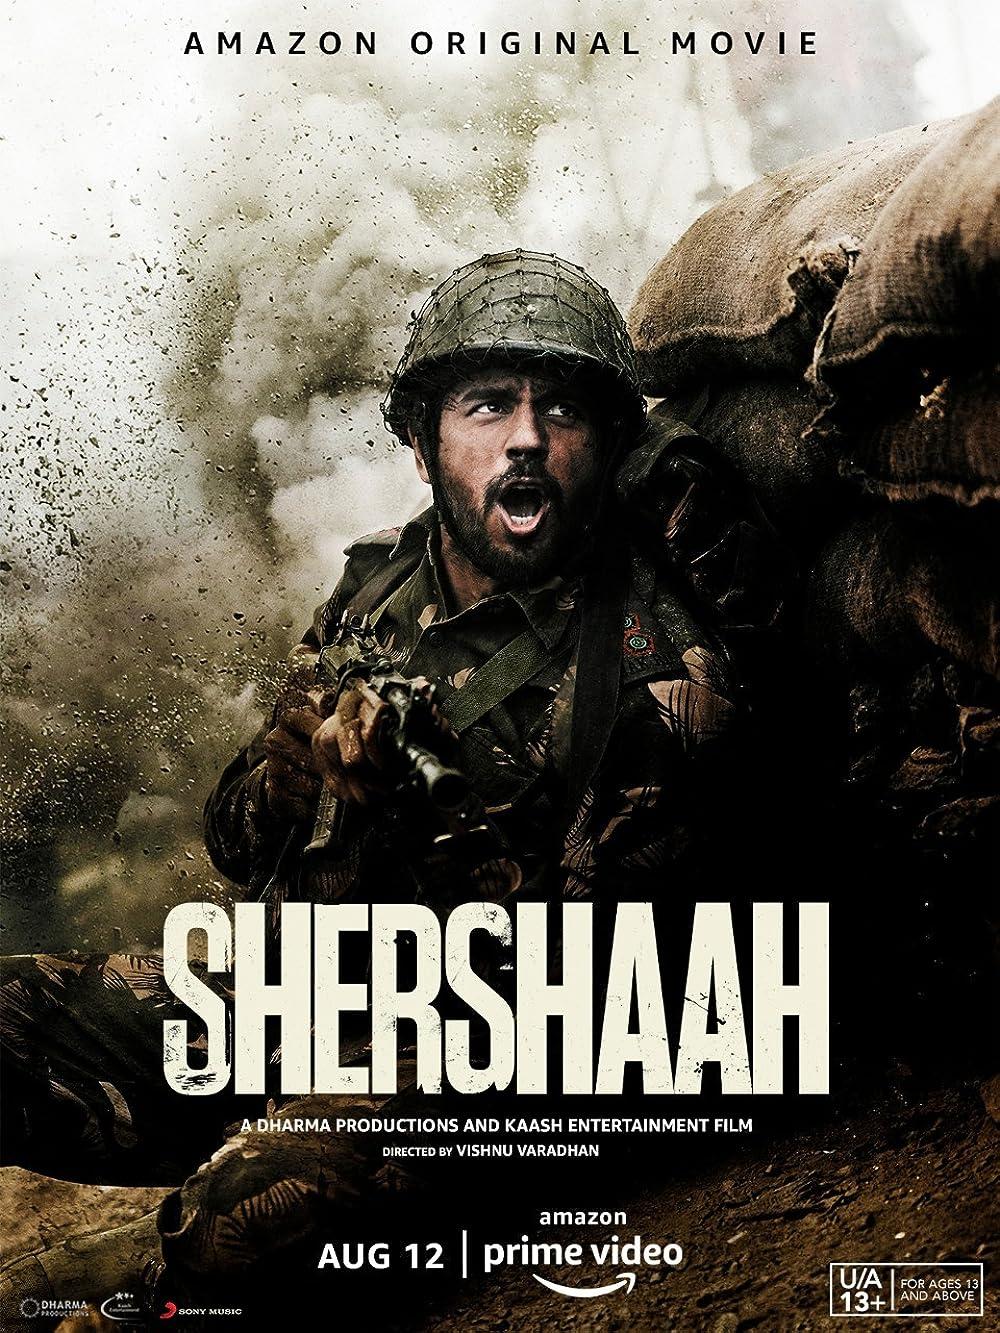 Shershaah 2021 Hindi Movie 720p AMZN HDRip ESub 1.2GB x264 AAC